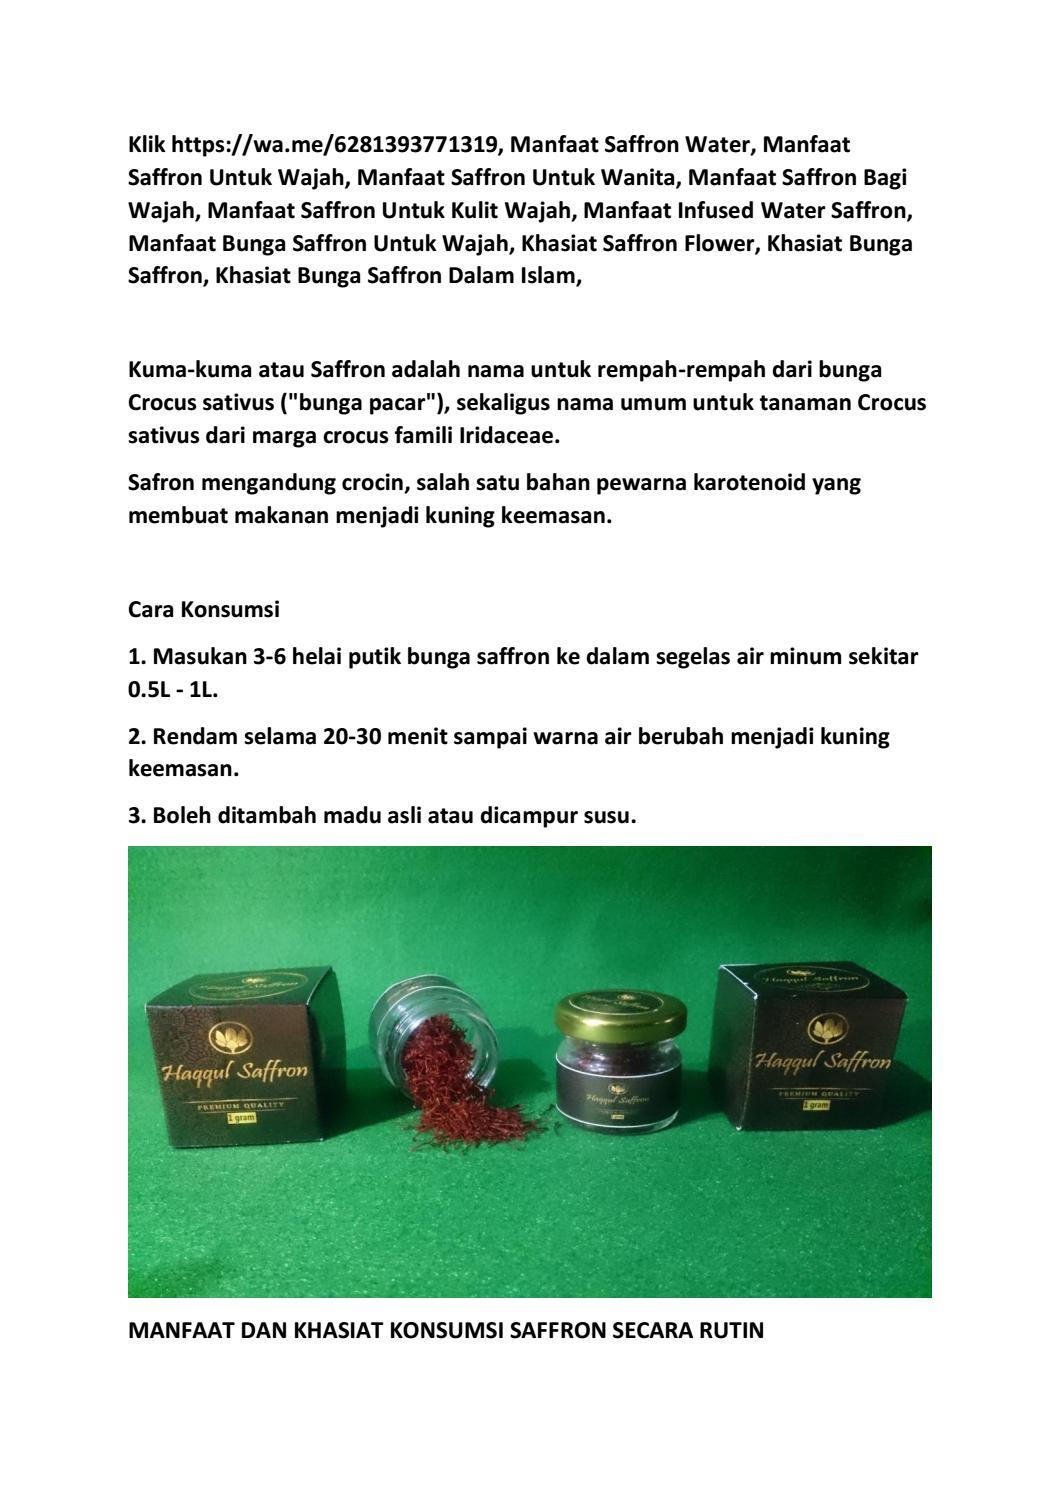 Hiqh Quality Harga Saffron Super Negin Di Kota Kendari 62 813 9377 1319 By Amri Ovan Issuu